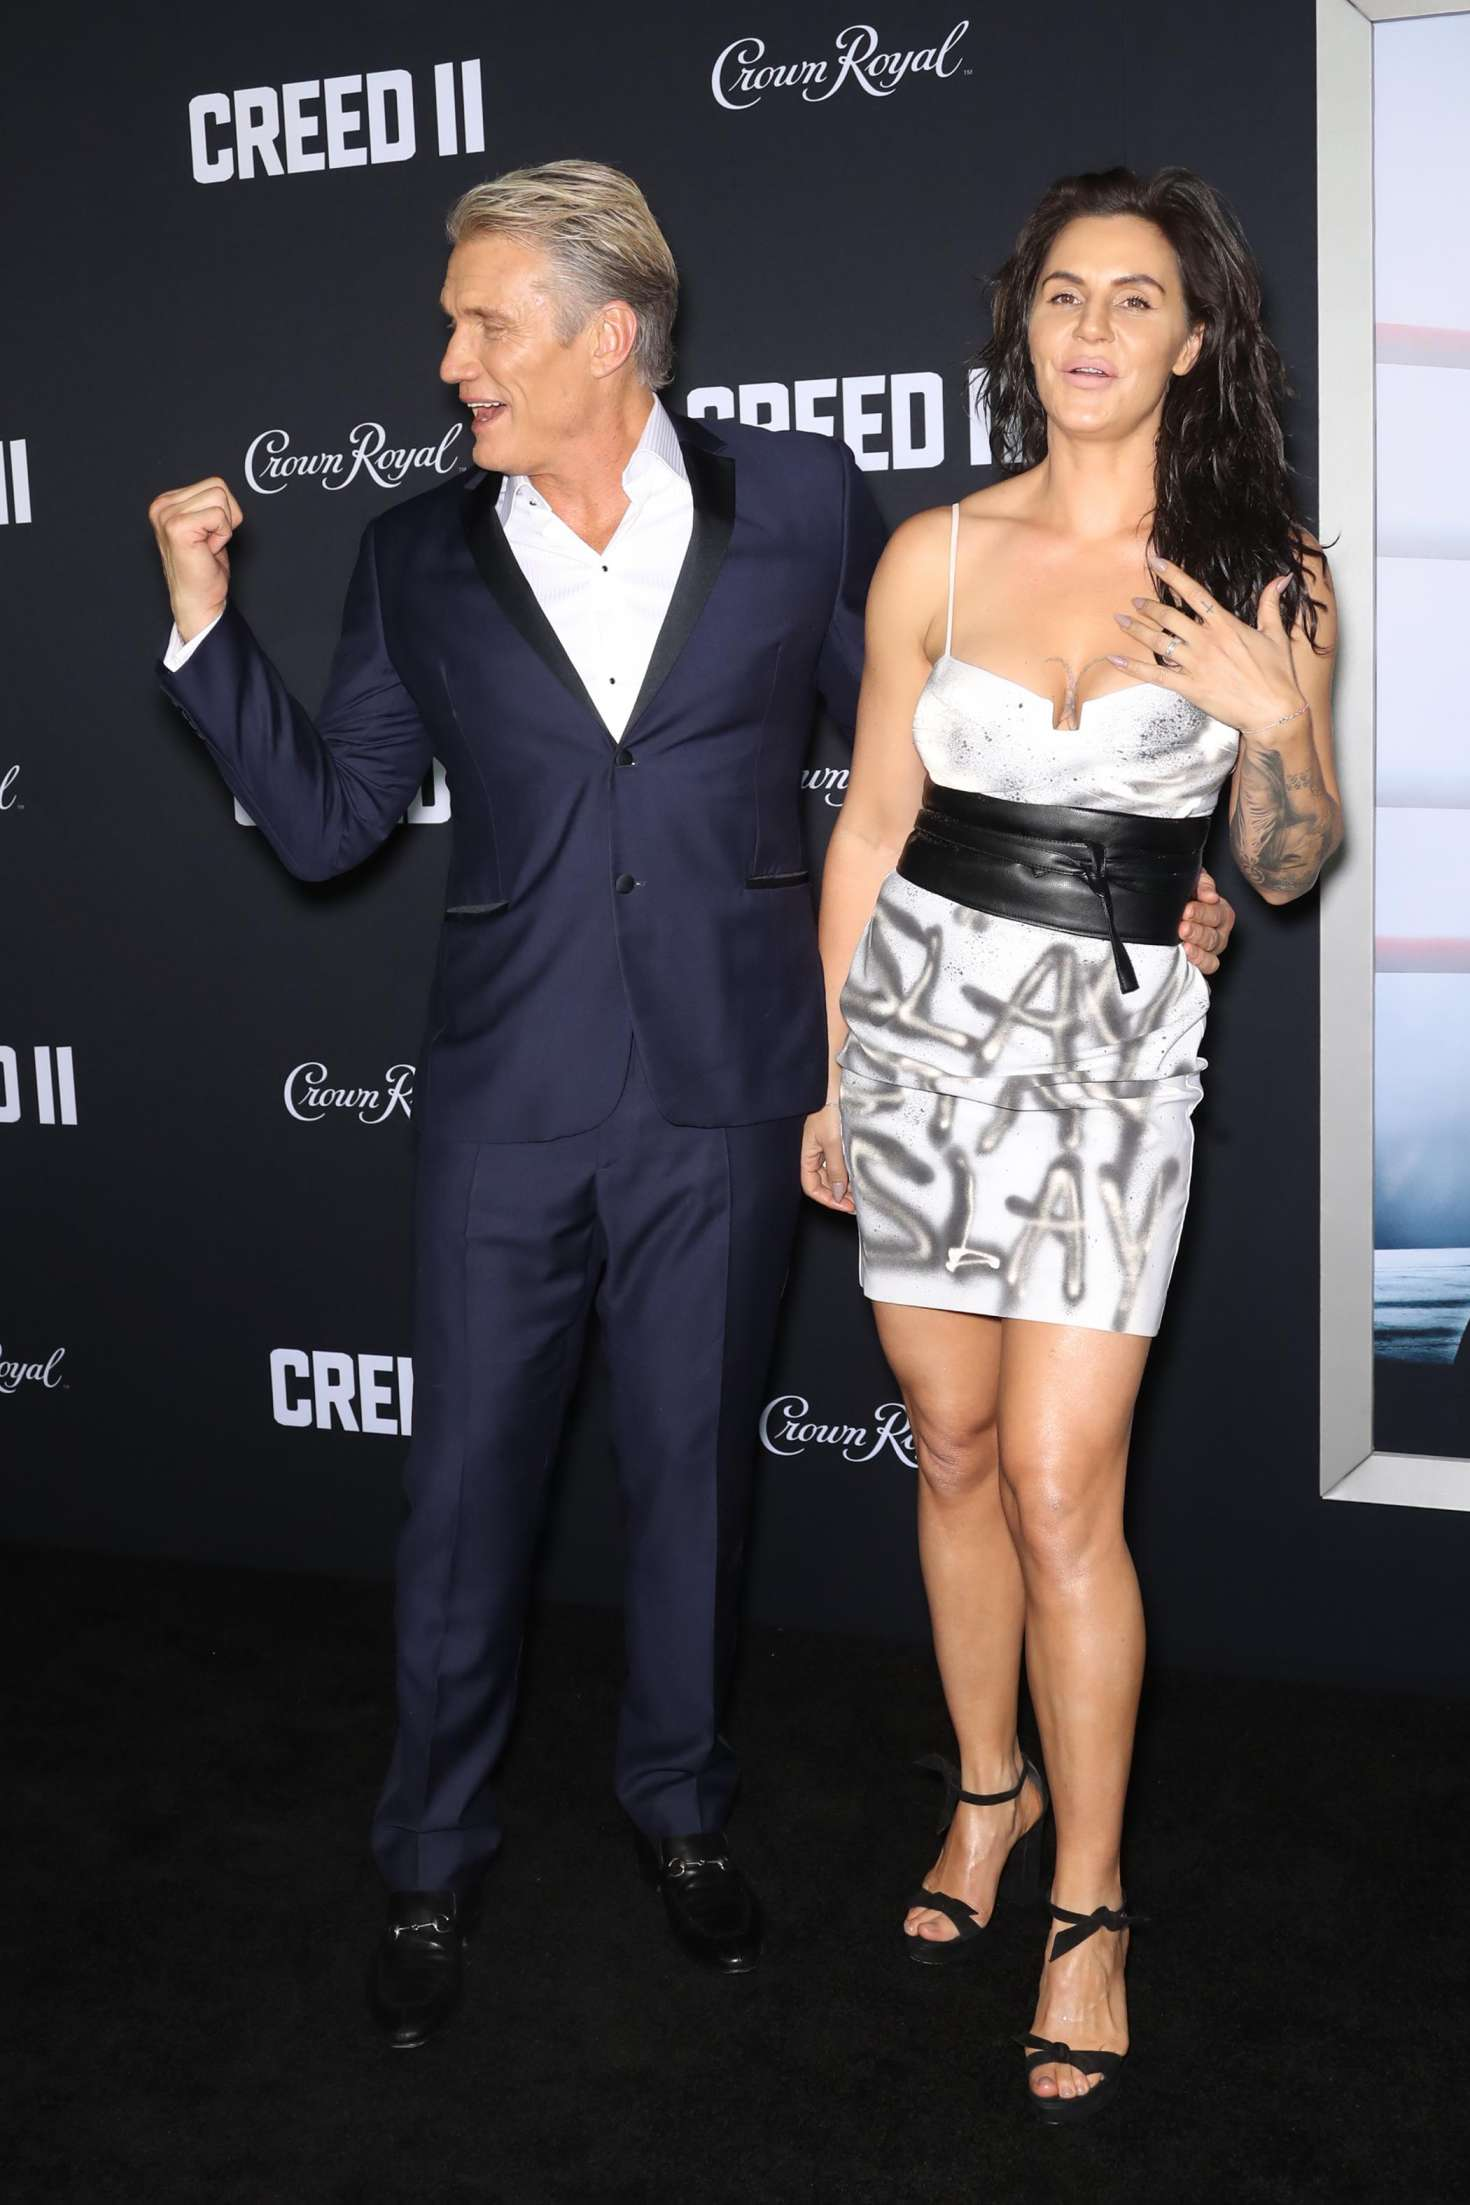 Jenny Sandersson 2018 : Jenny Sandersson: Creed 2 Premiere -01